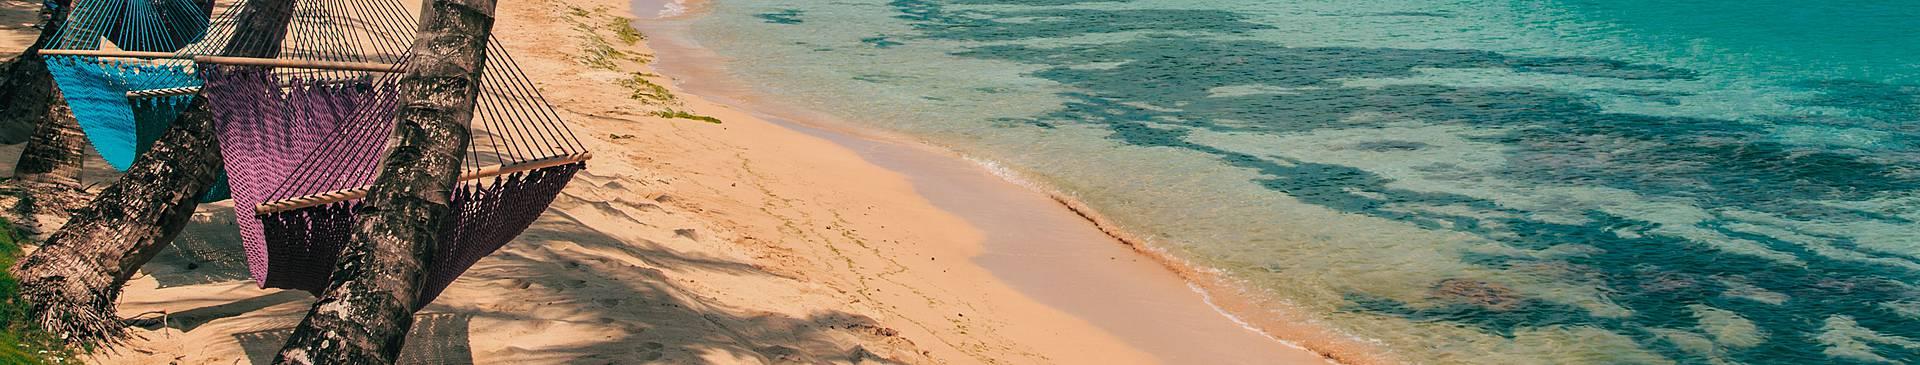 Voyage plage au Nicaragua